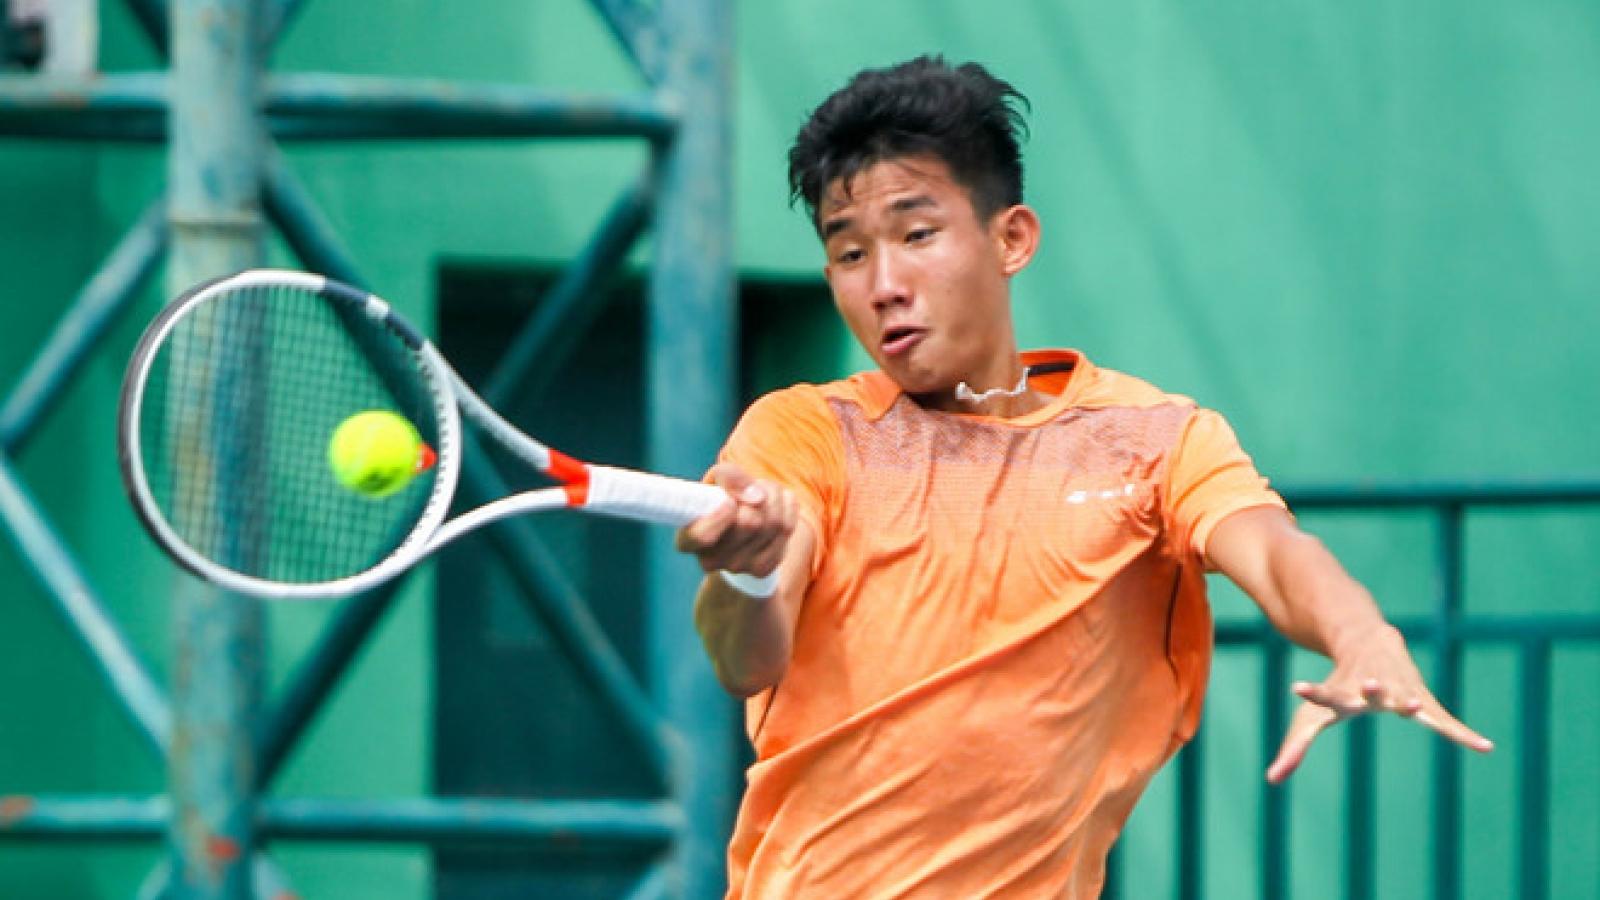 Nguyen Van Phuong qualifies for second round of Wimbledon Juniors